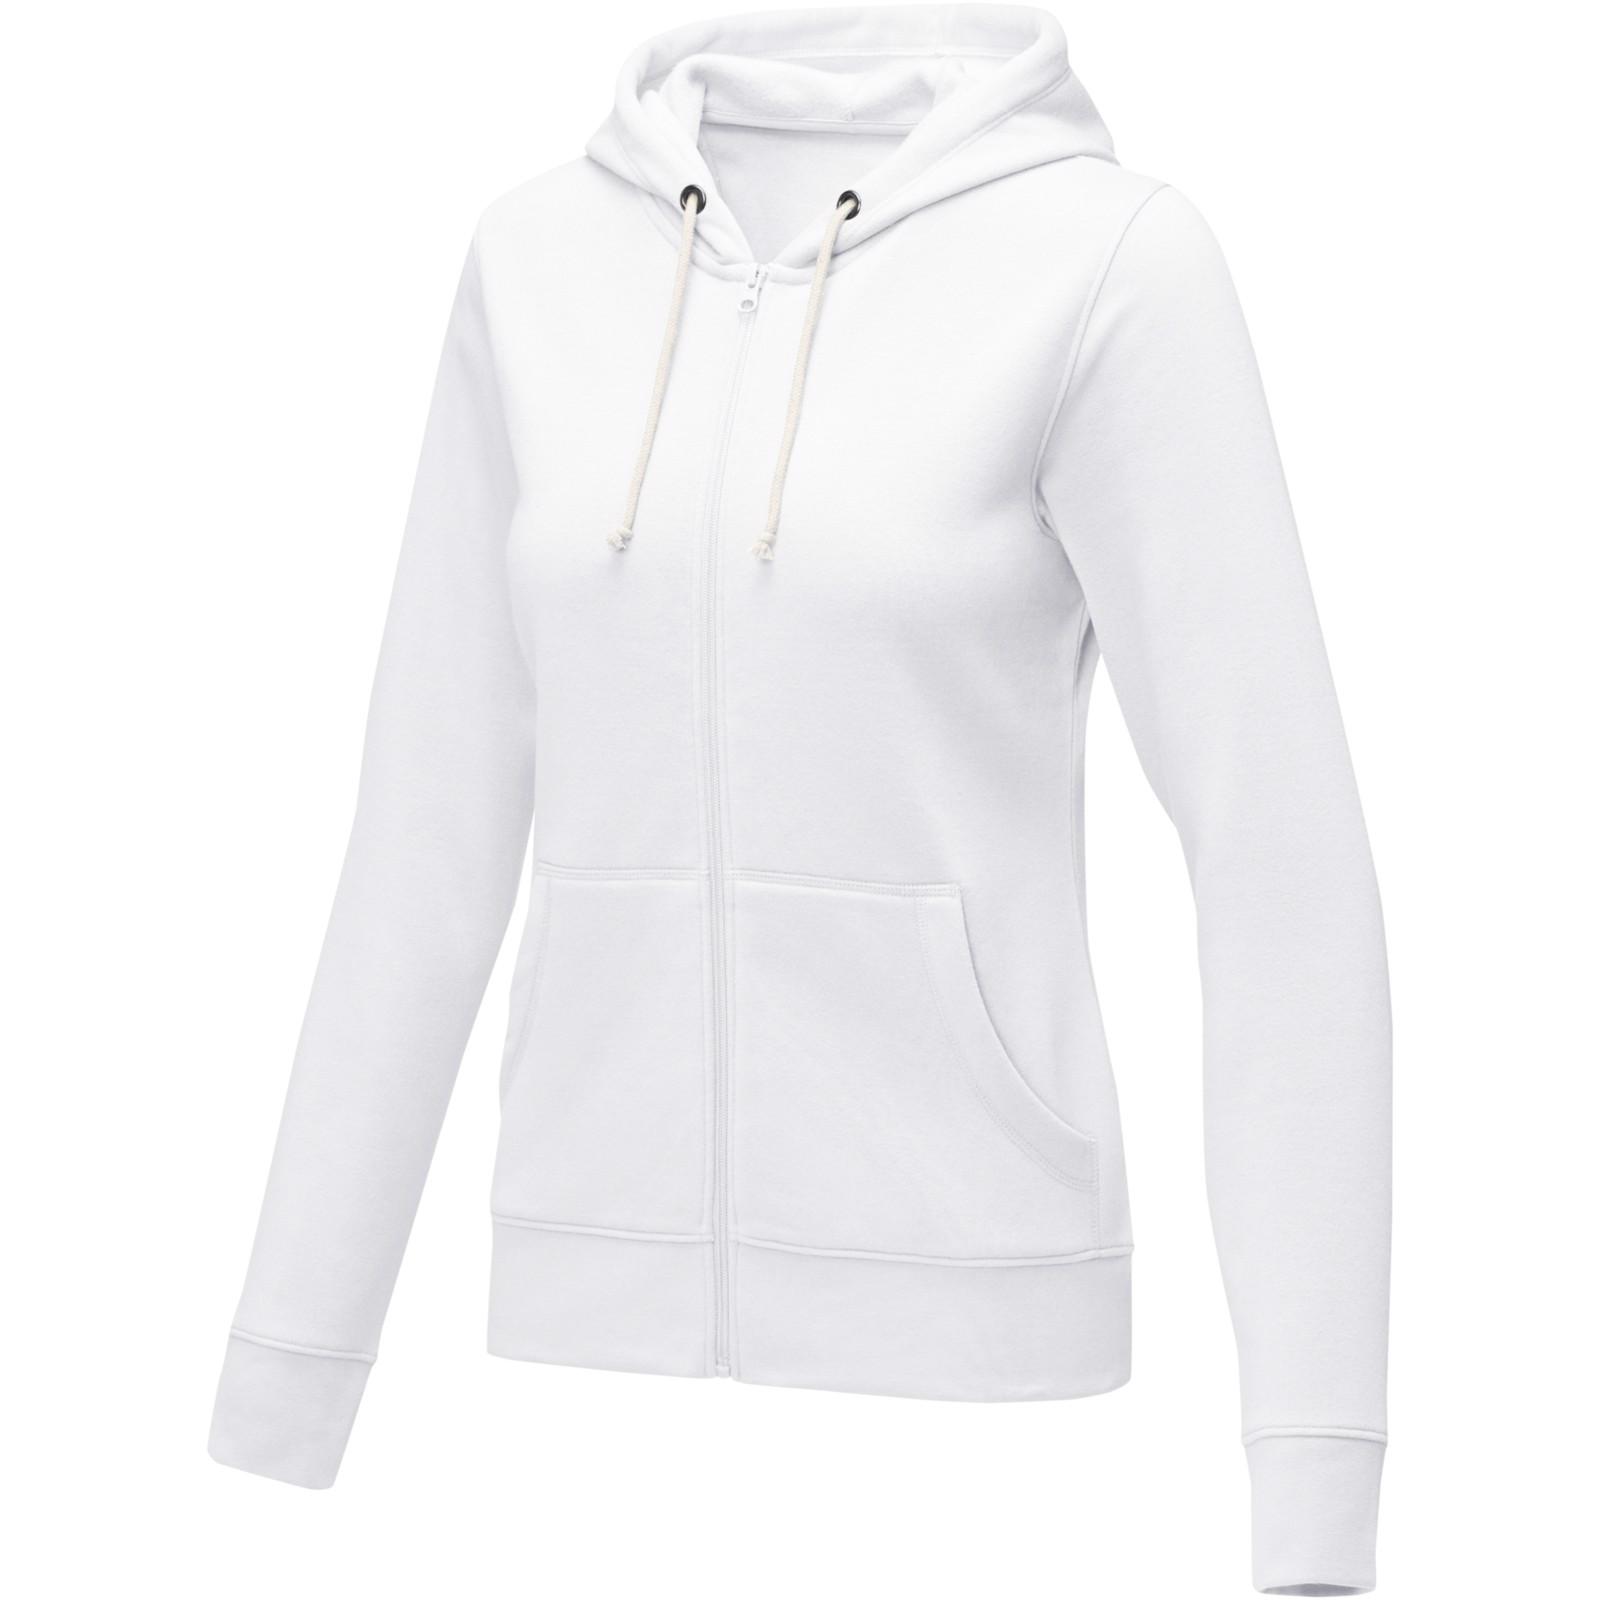 Theron women's full zip hoodie - White / L